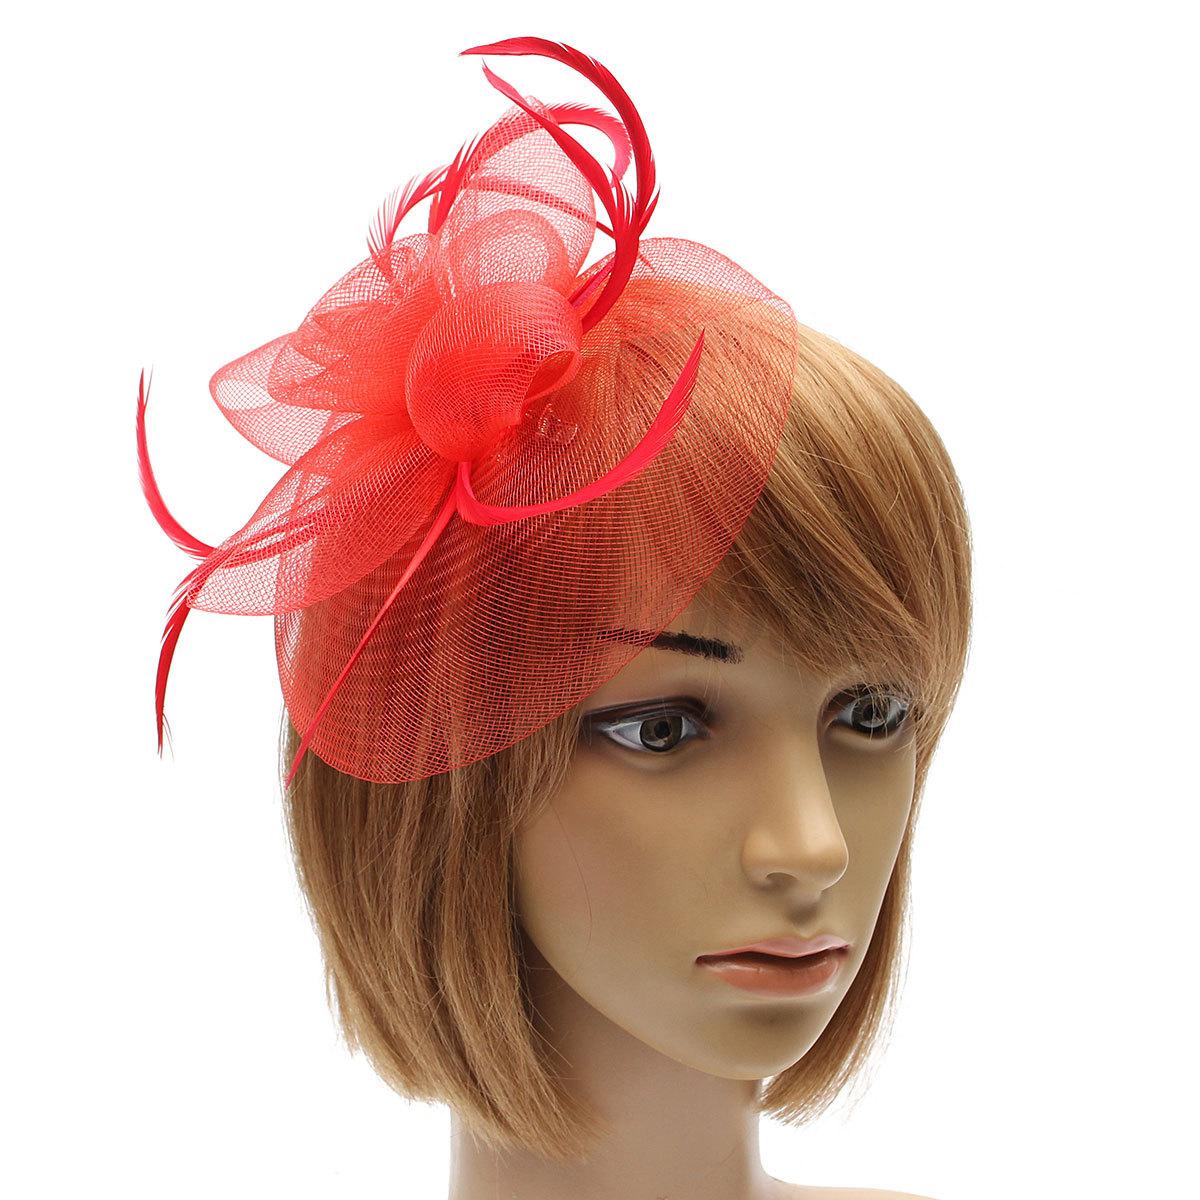 Hair Clip Women Fascinator Feathers Headpieces Flower Wedding Party Headband New  eBay